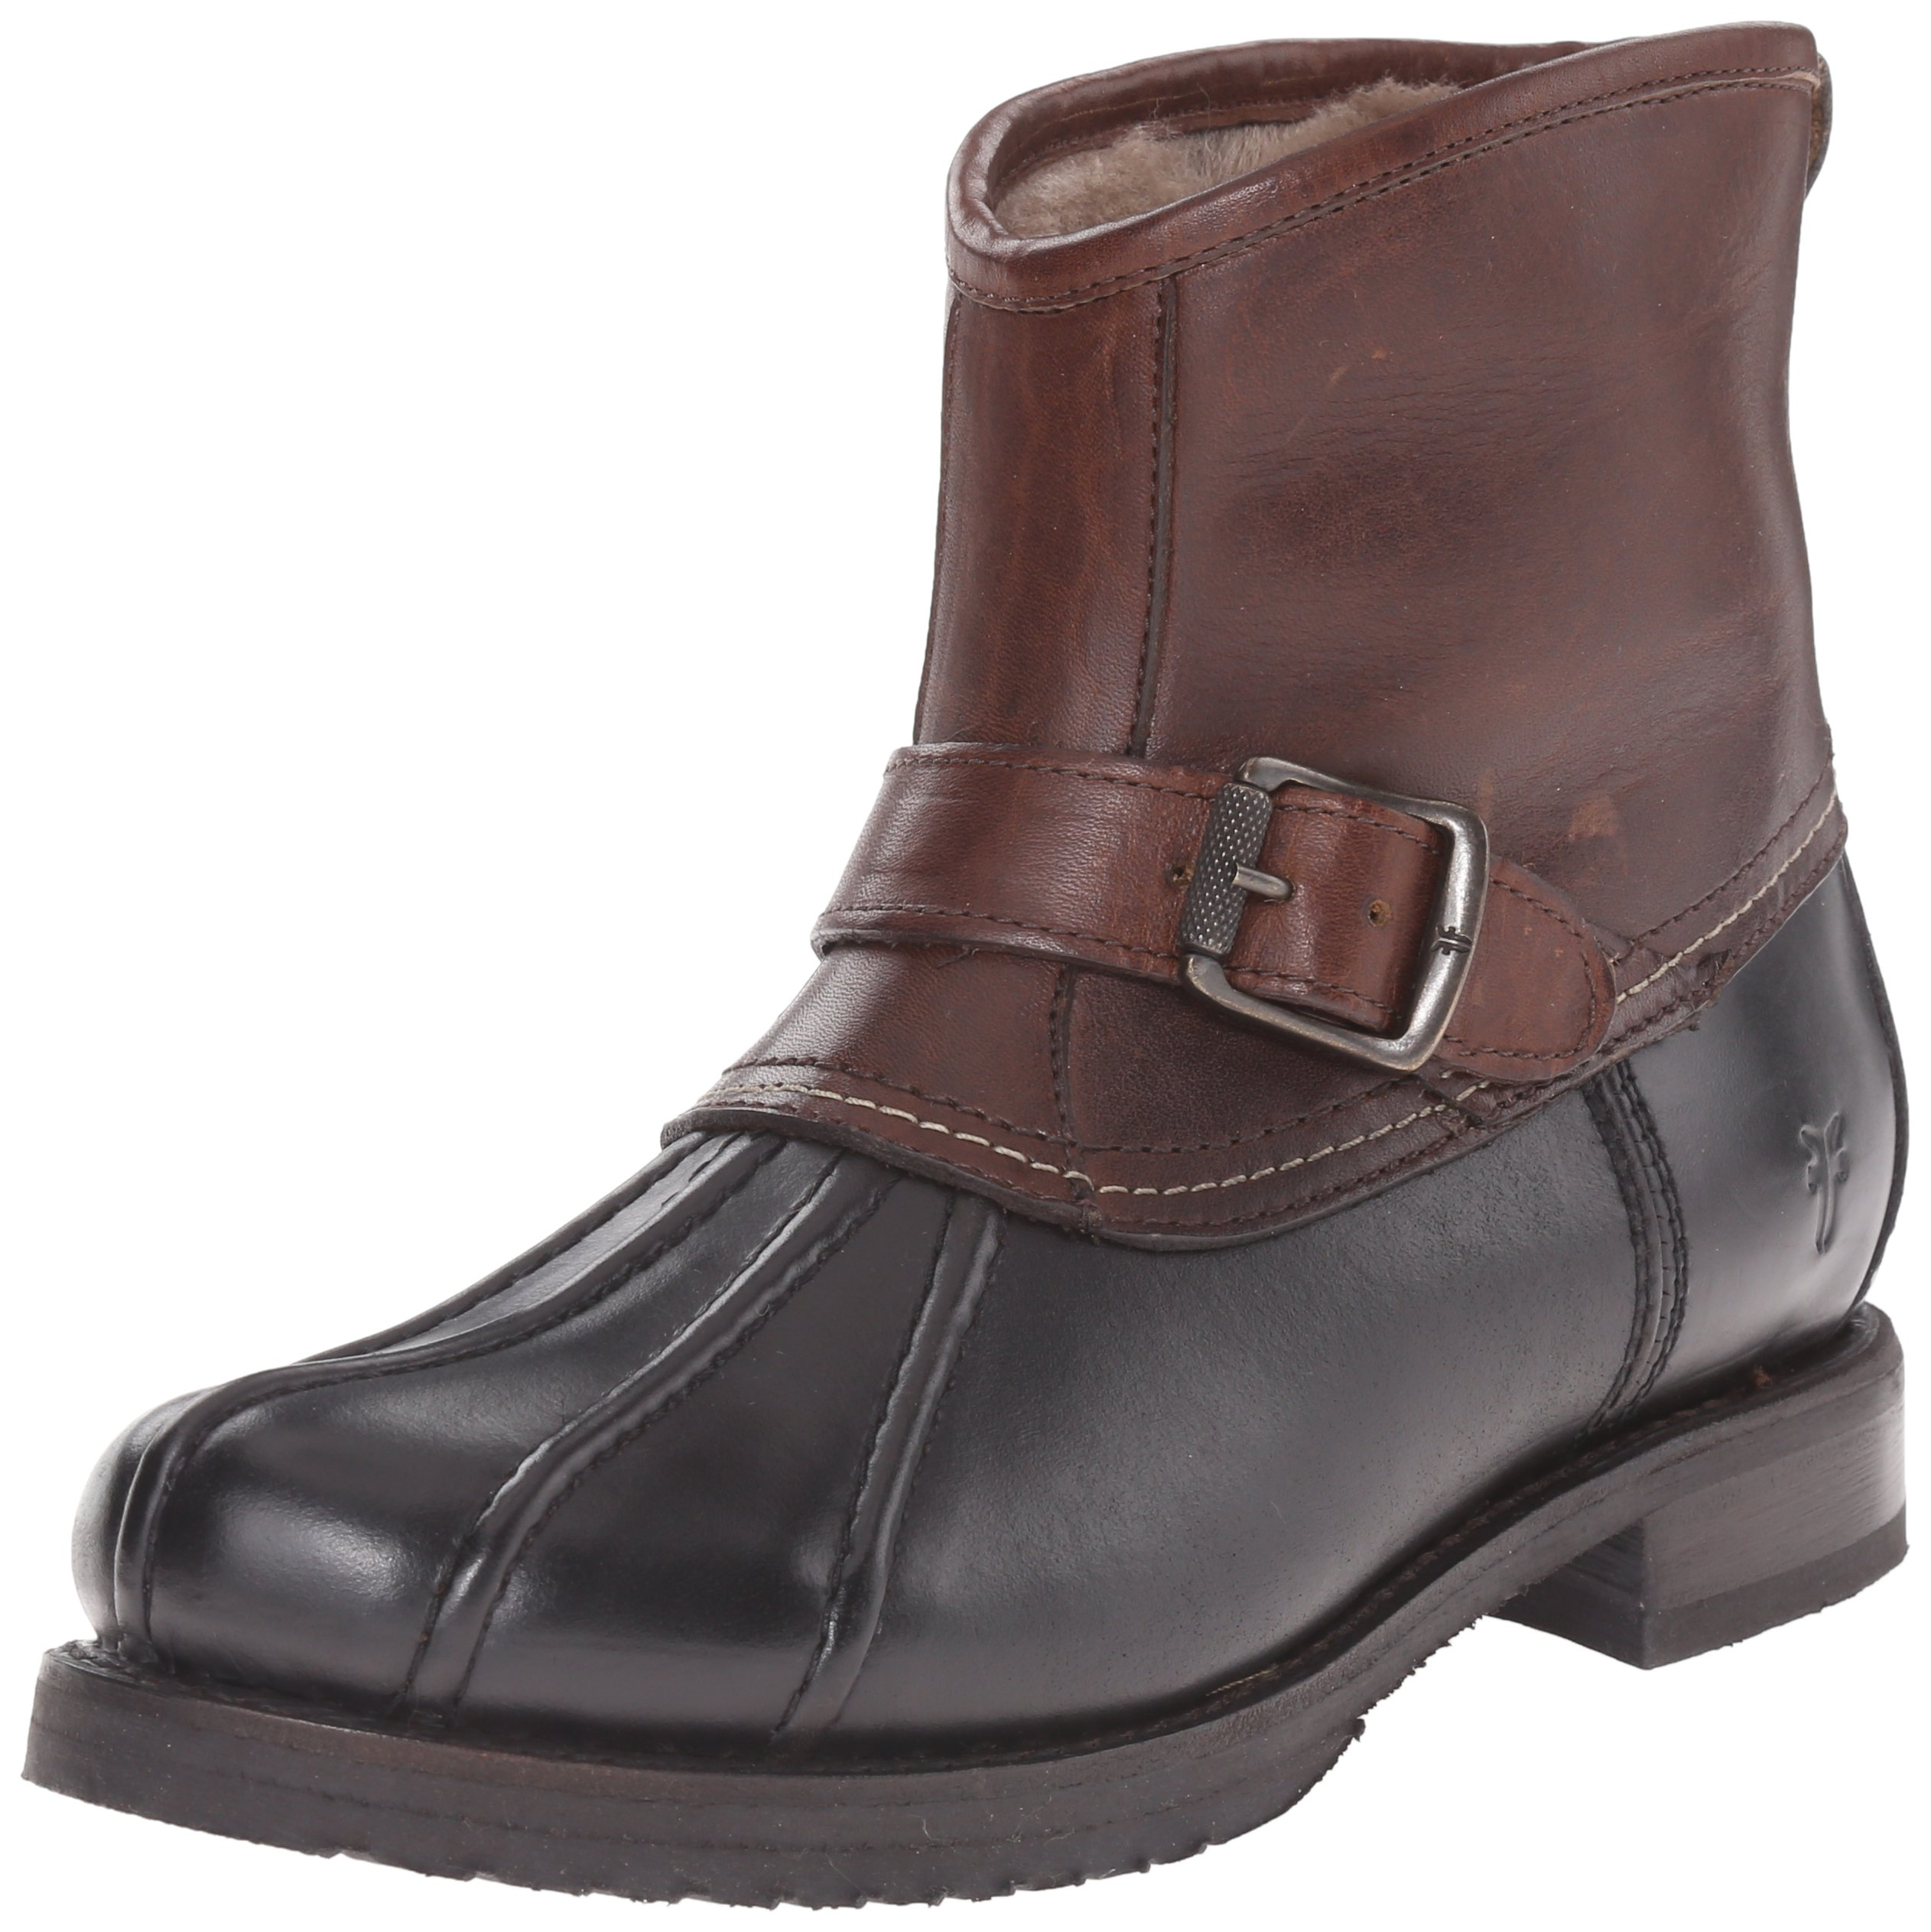 FRYE Women's Veronica Duck Engineer Winter Boot,  Black/Multi, 7 M US